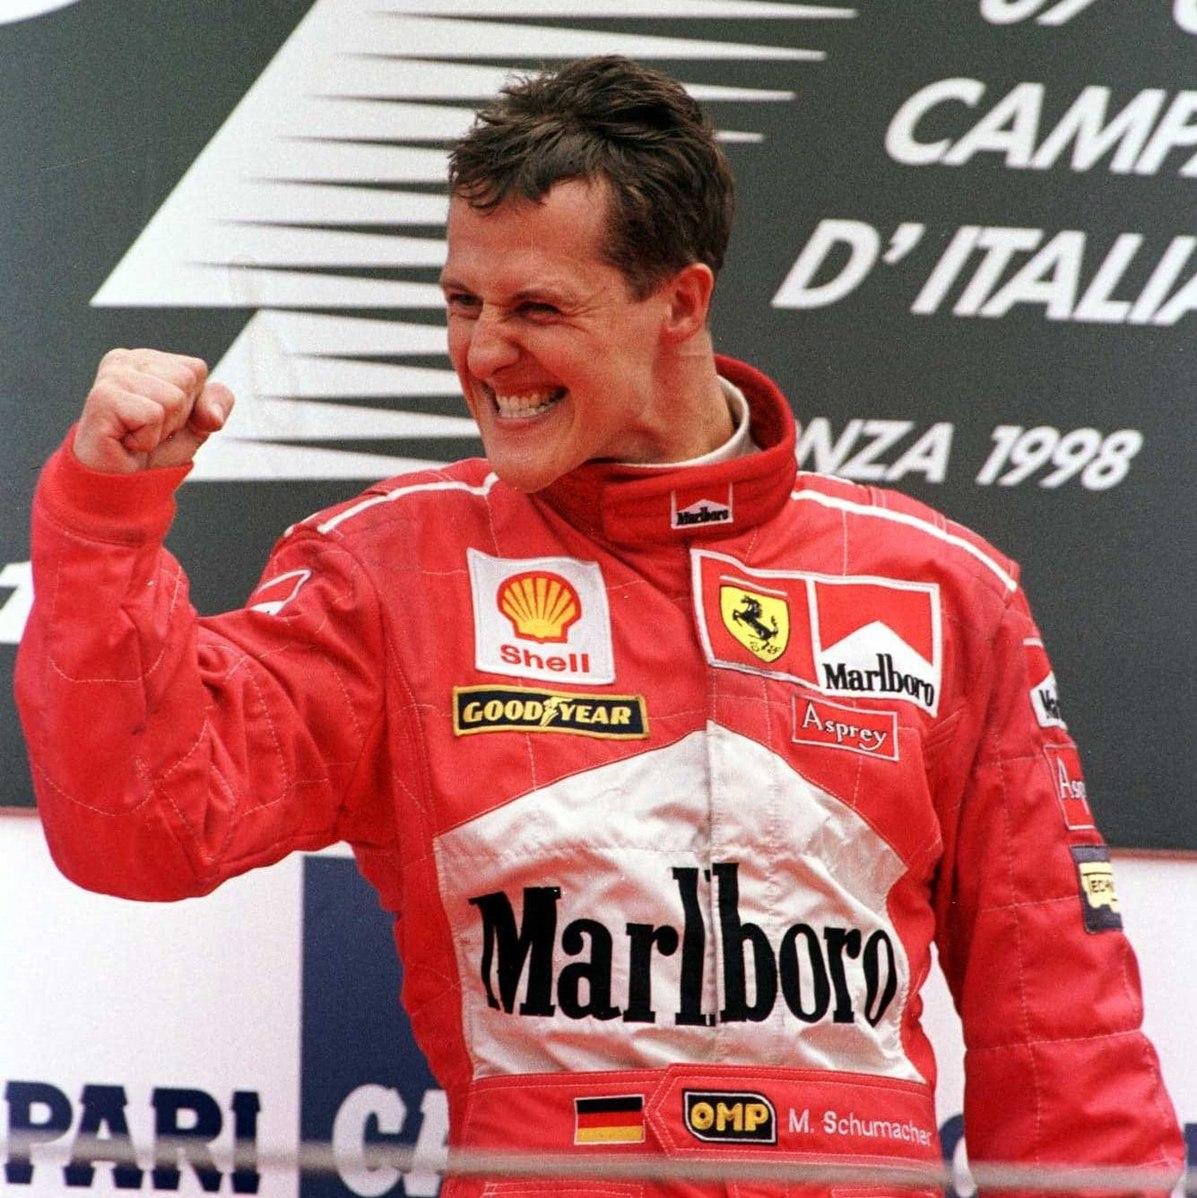 Michael-Schumacher-(Ferrari)